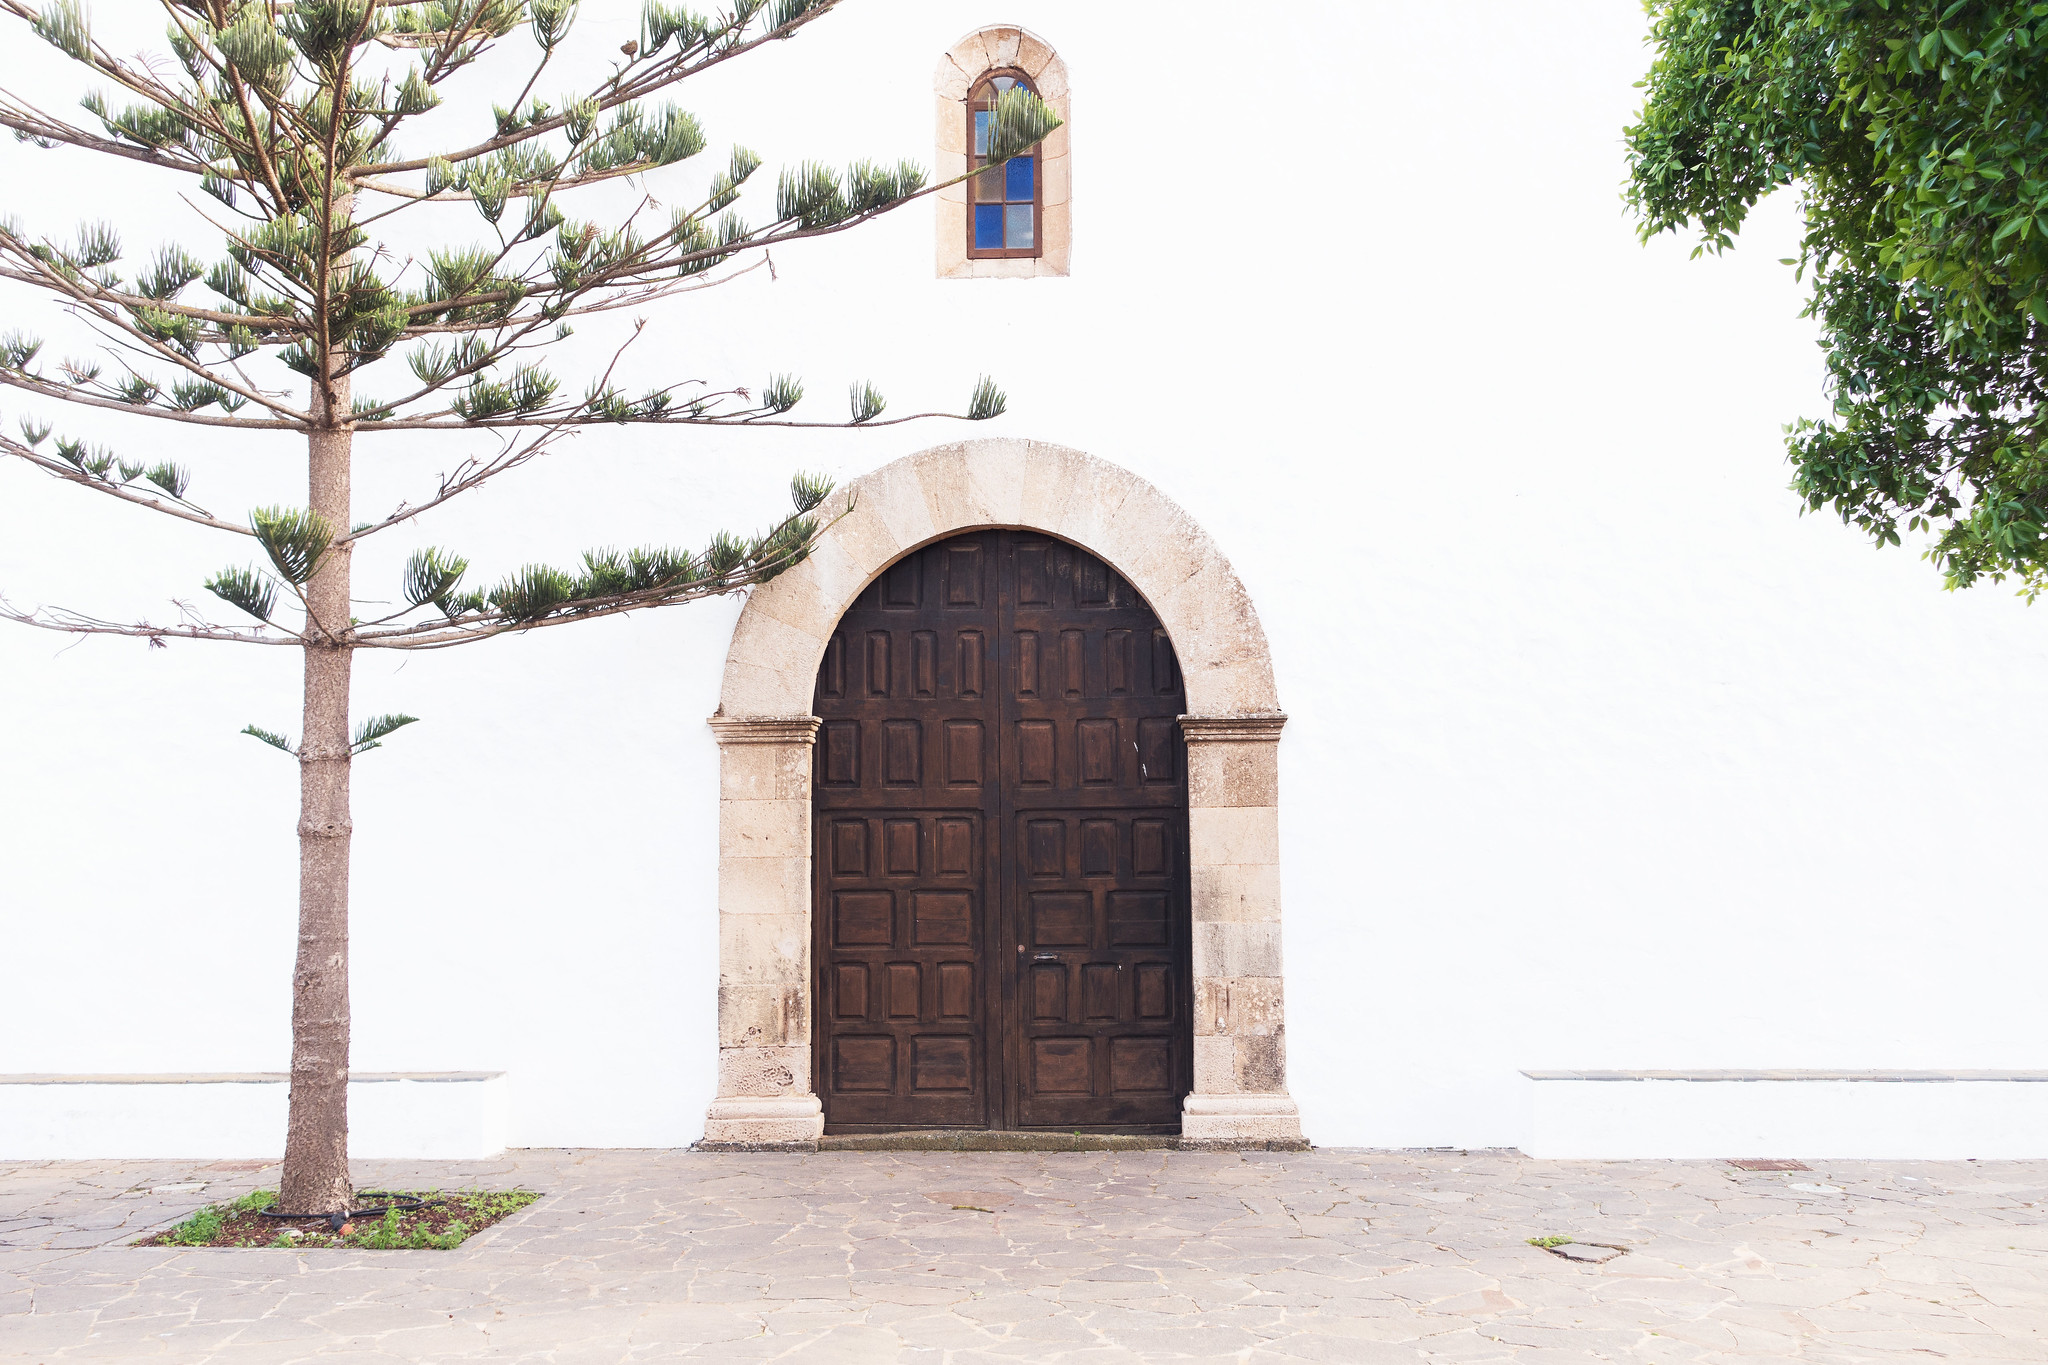 The Streets of Fuerteventura